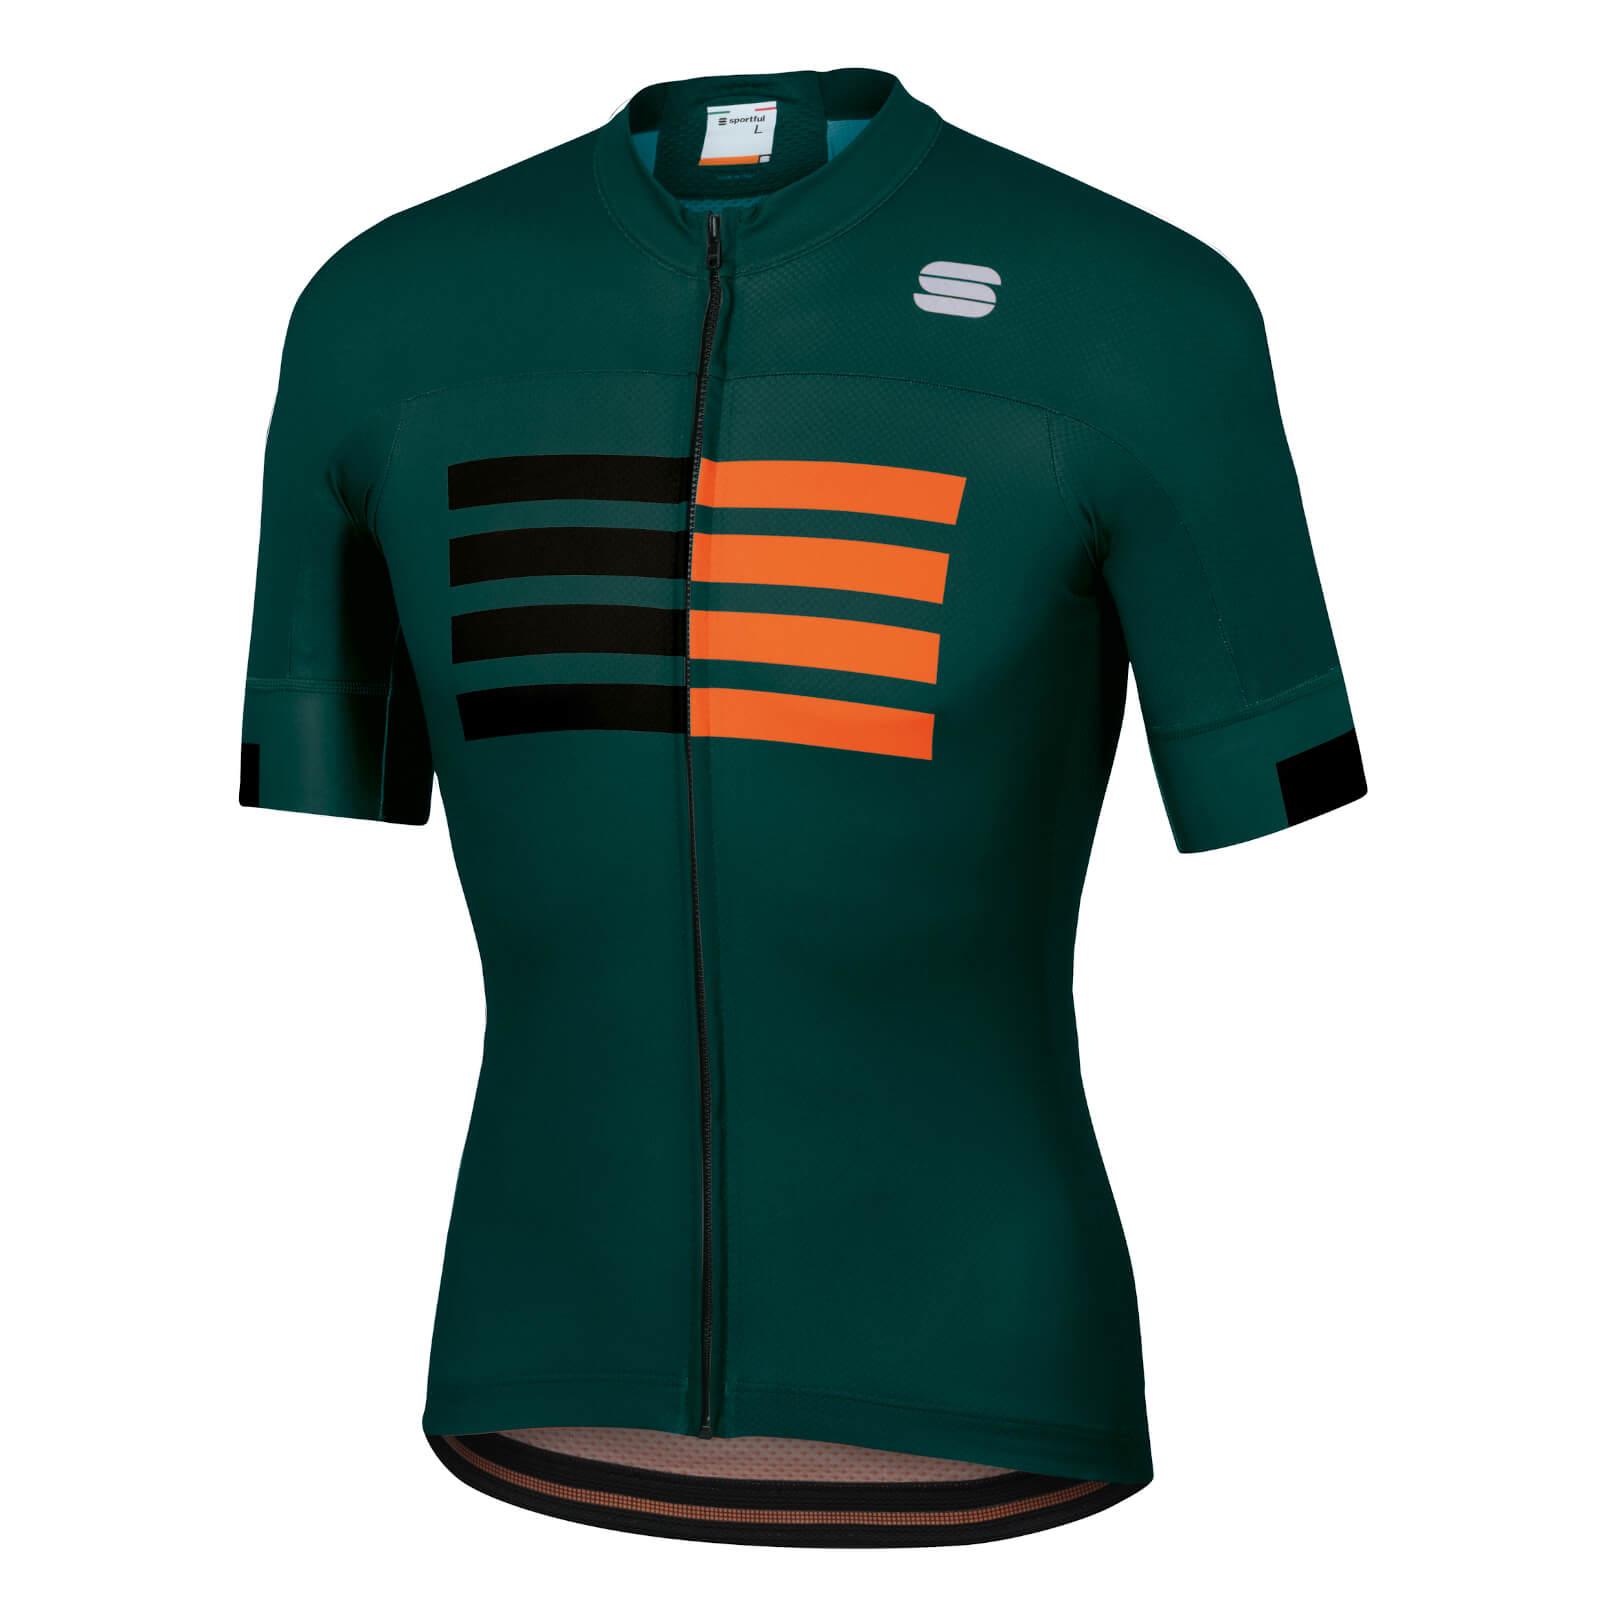 Sportful Wire Jersey - S - Sea Moss/Black/Orange SDR